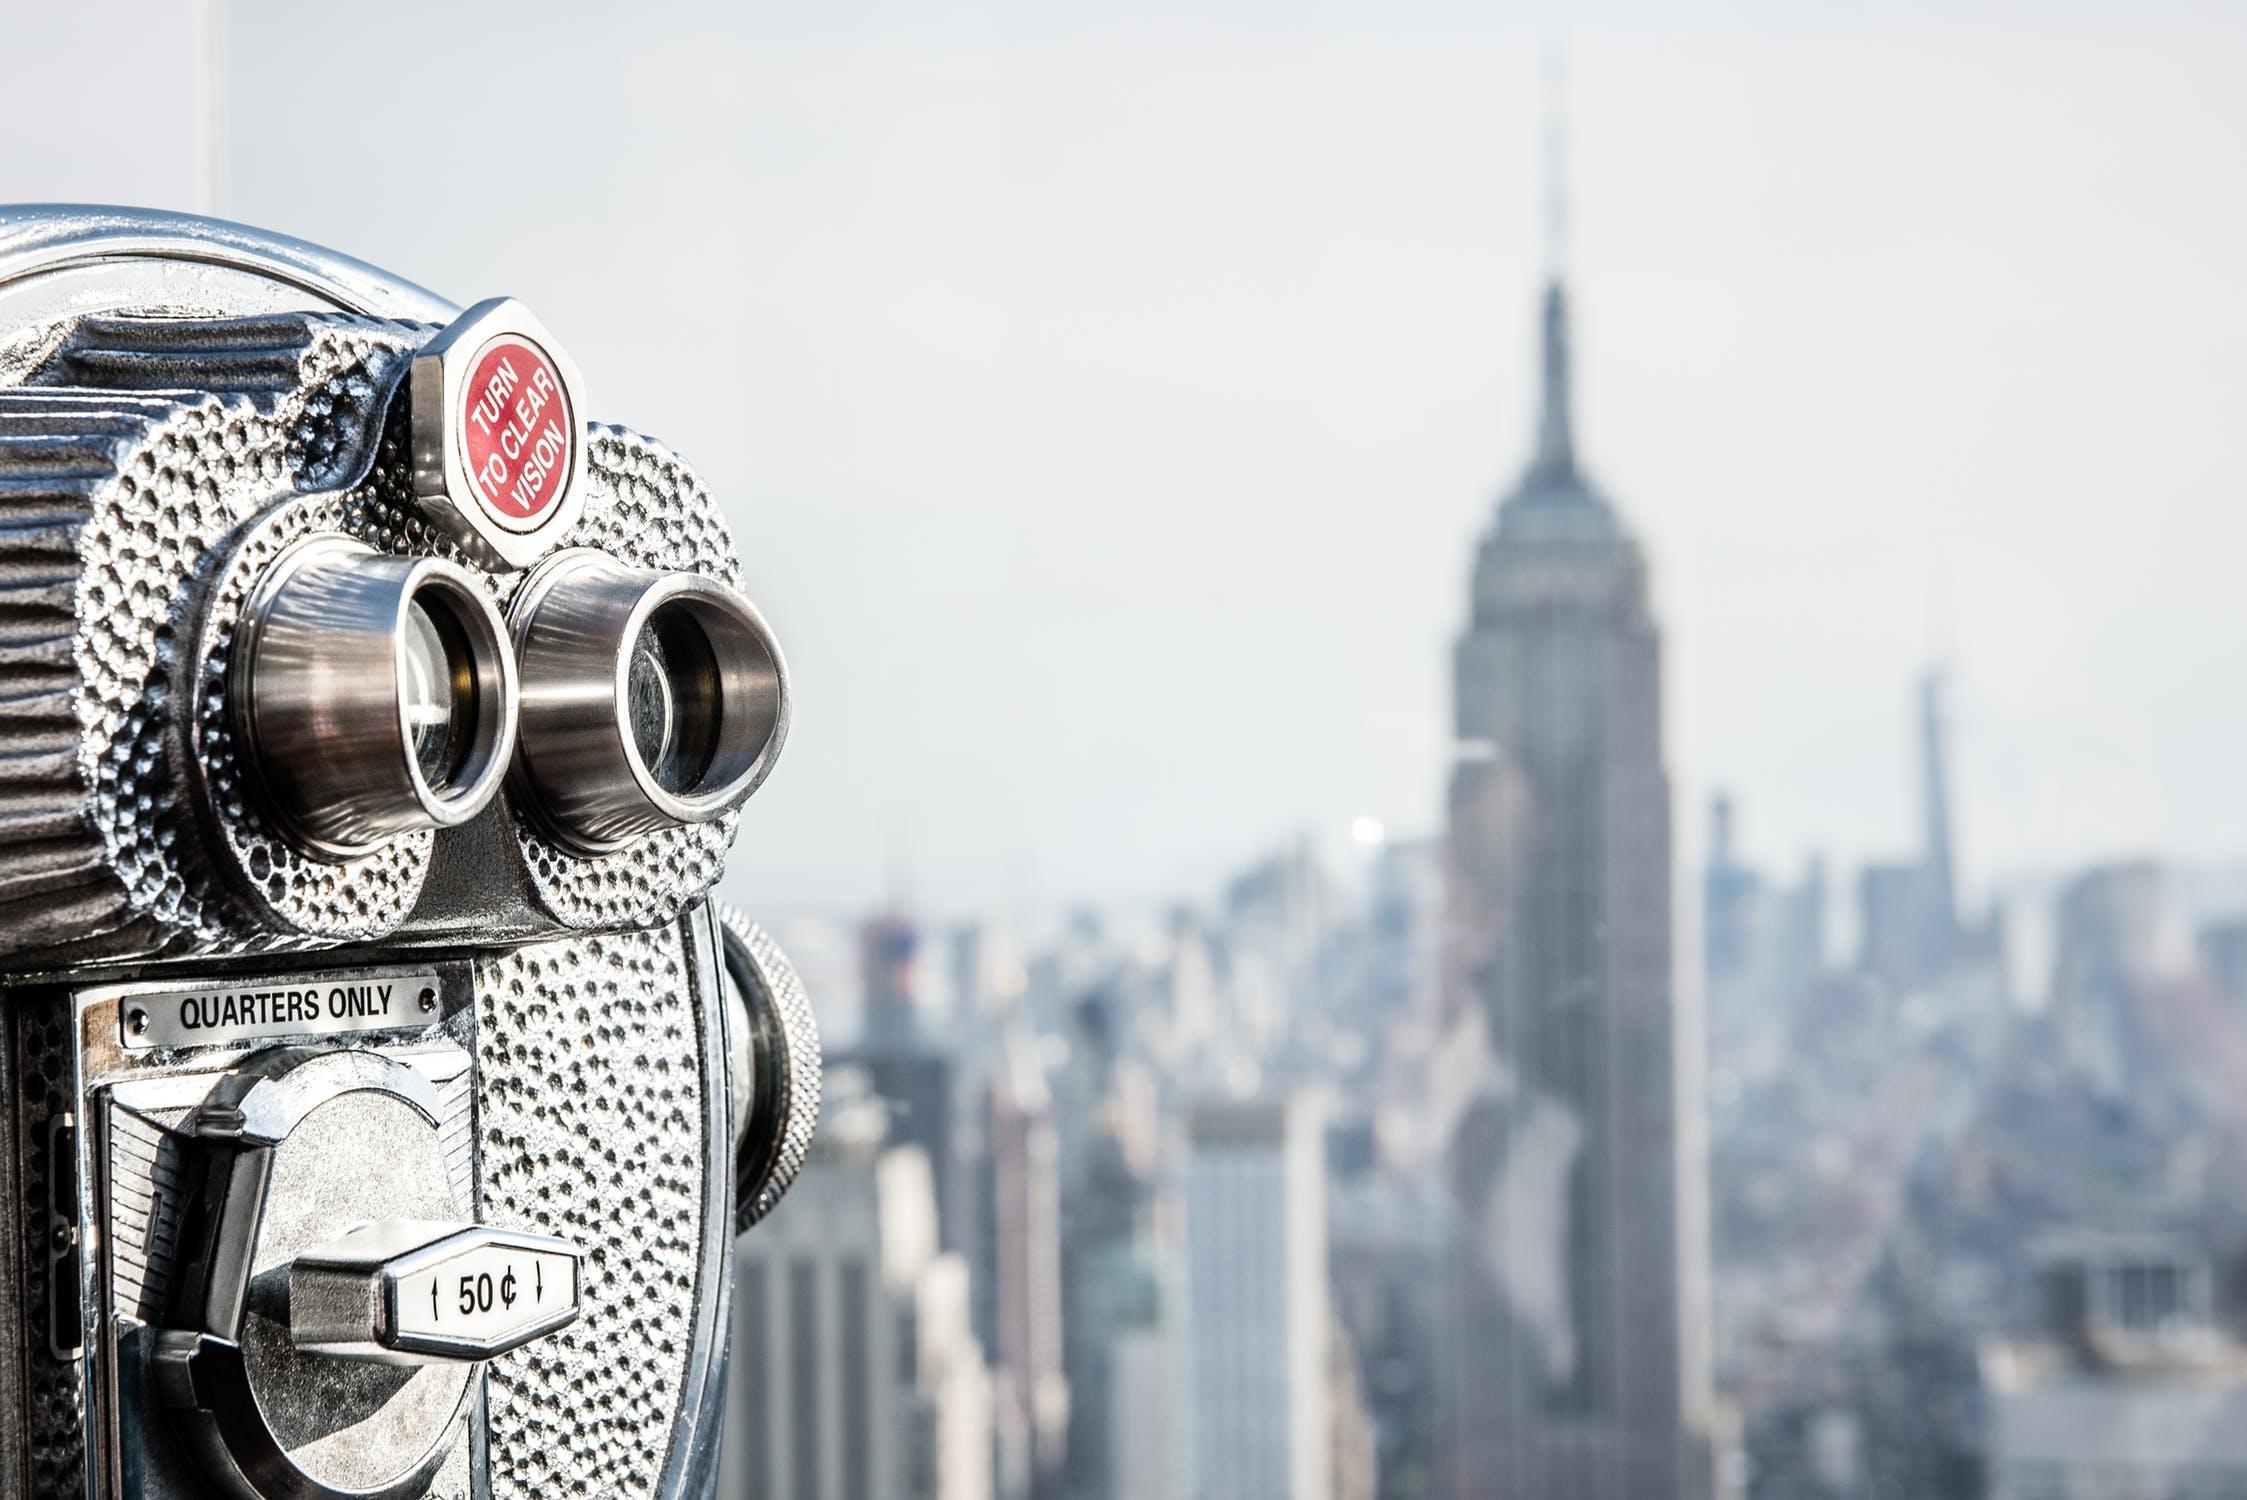 new york city viewfinder